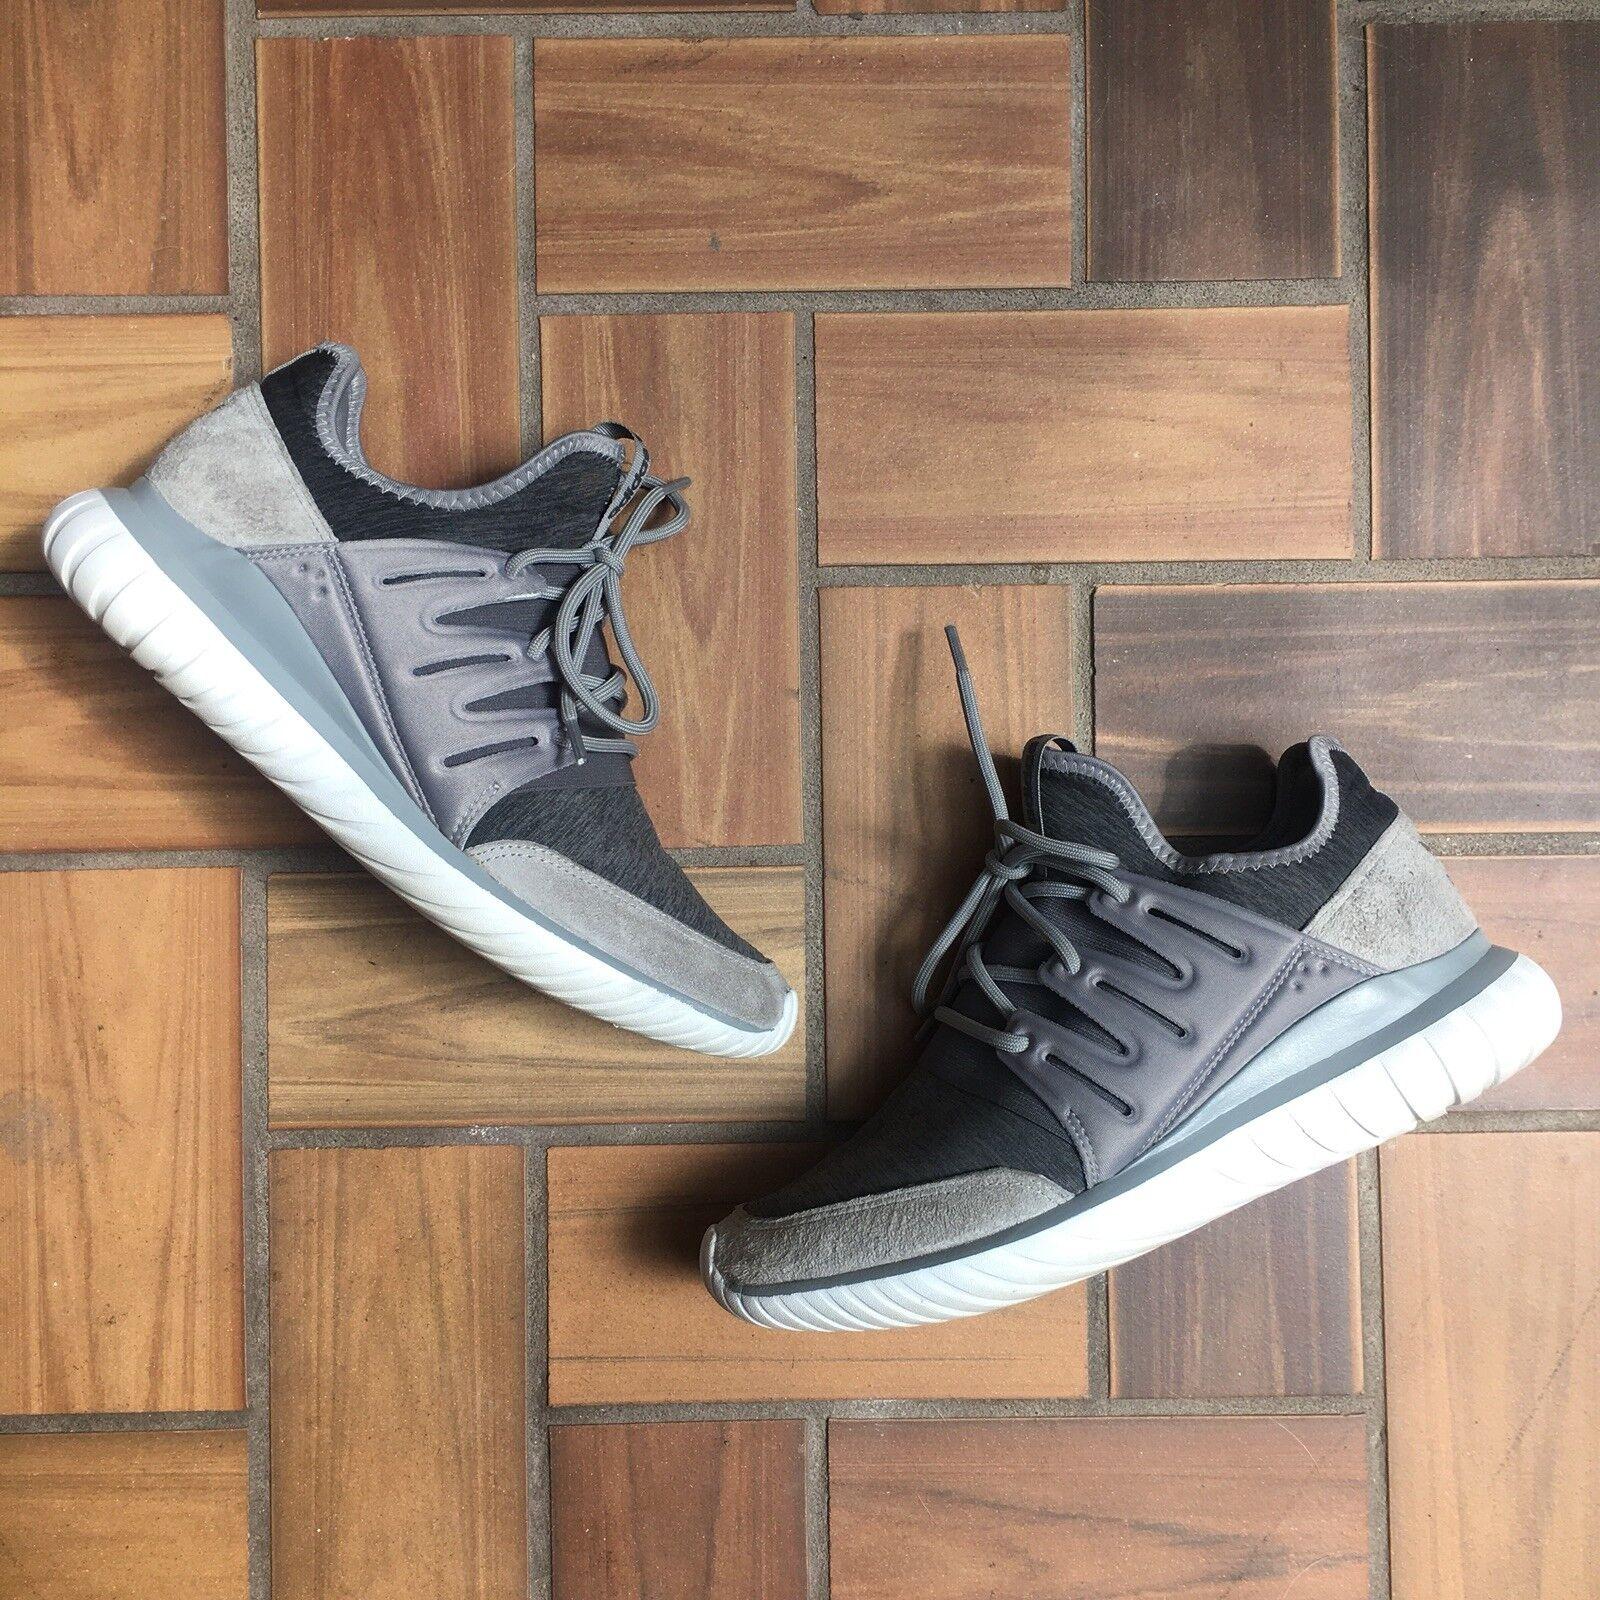 Adidas Originals Tubular Radial / Fleece Grey White / Men's 10.5